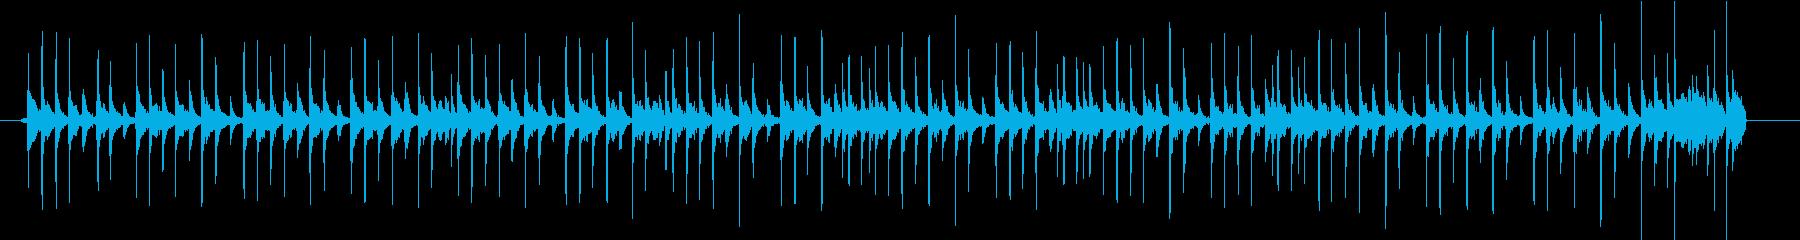 Lo-Fi drumloopドラムループの再生済みの波形